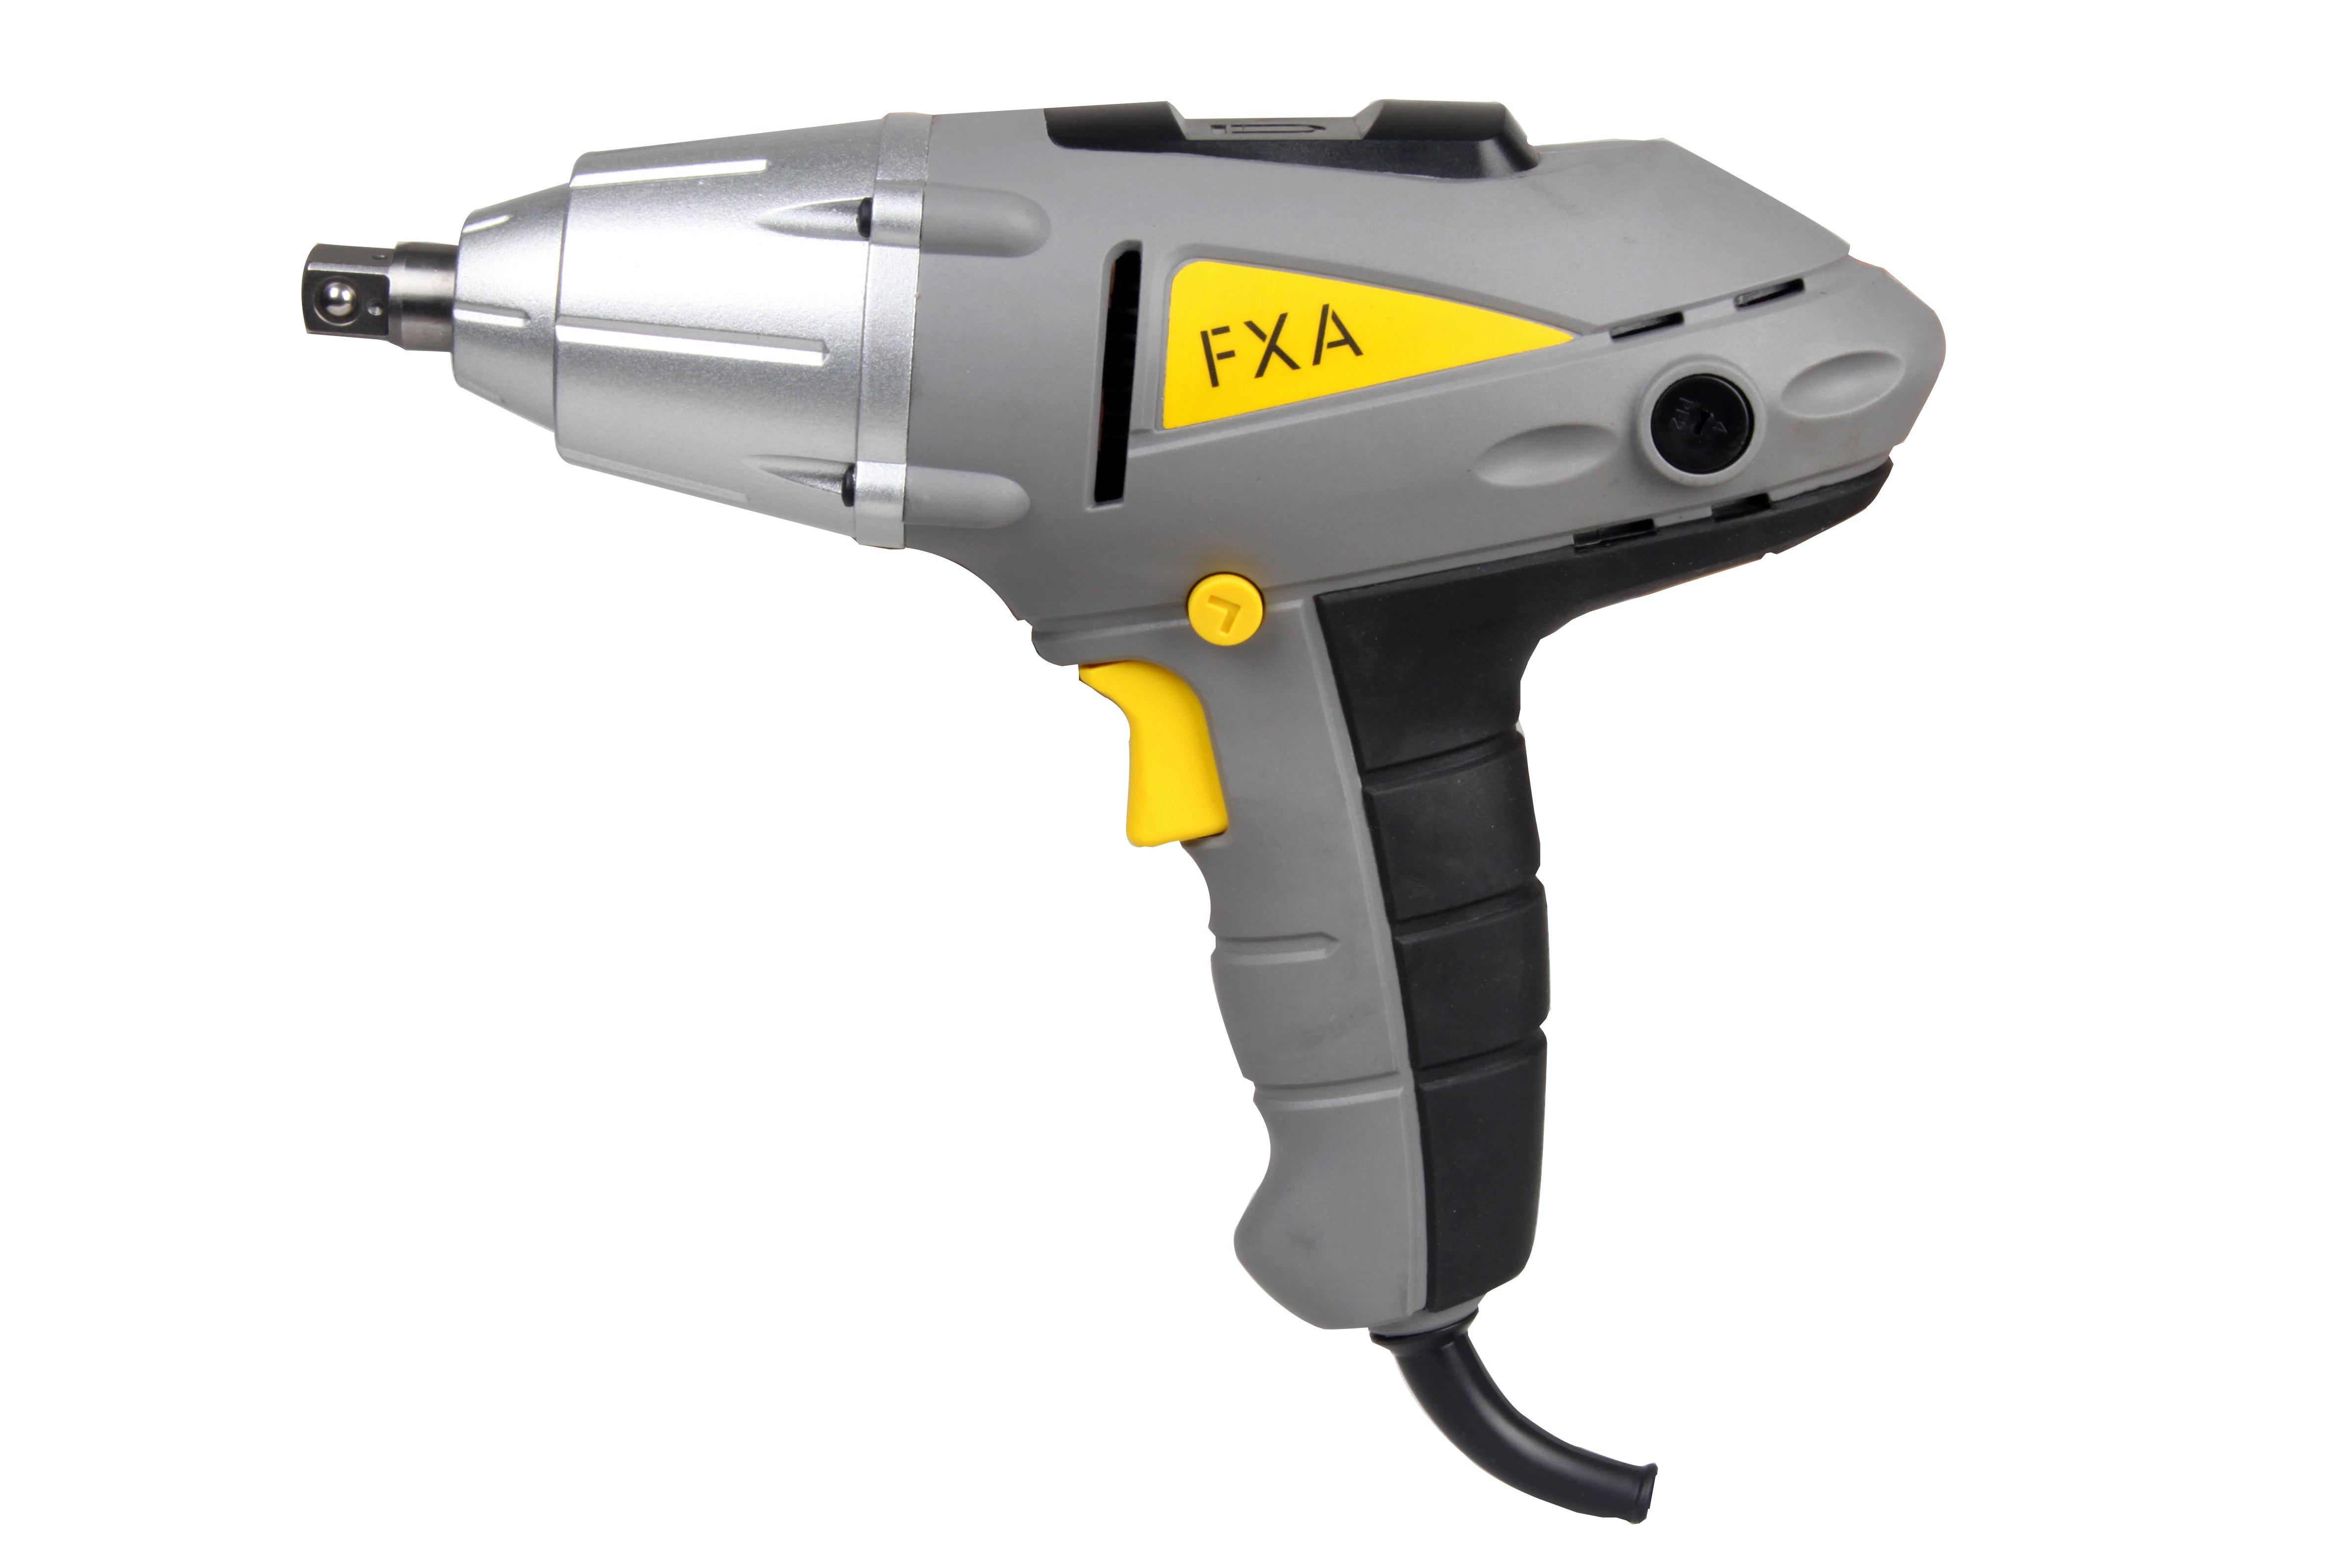 Slagmutterdragare FXA 500W 1/2IN